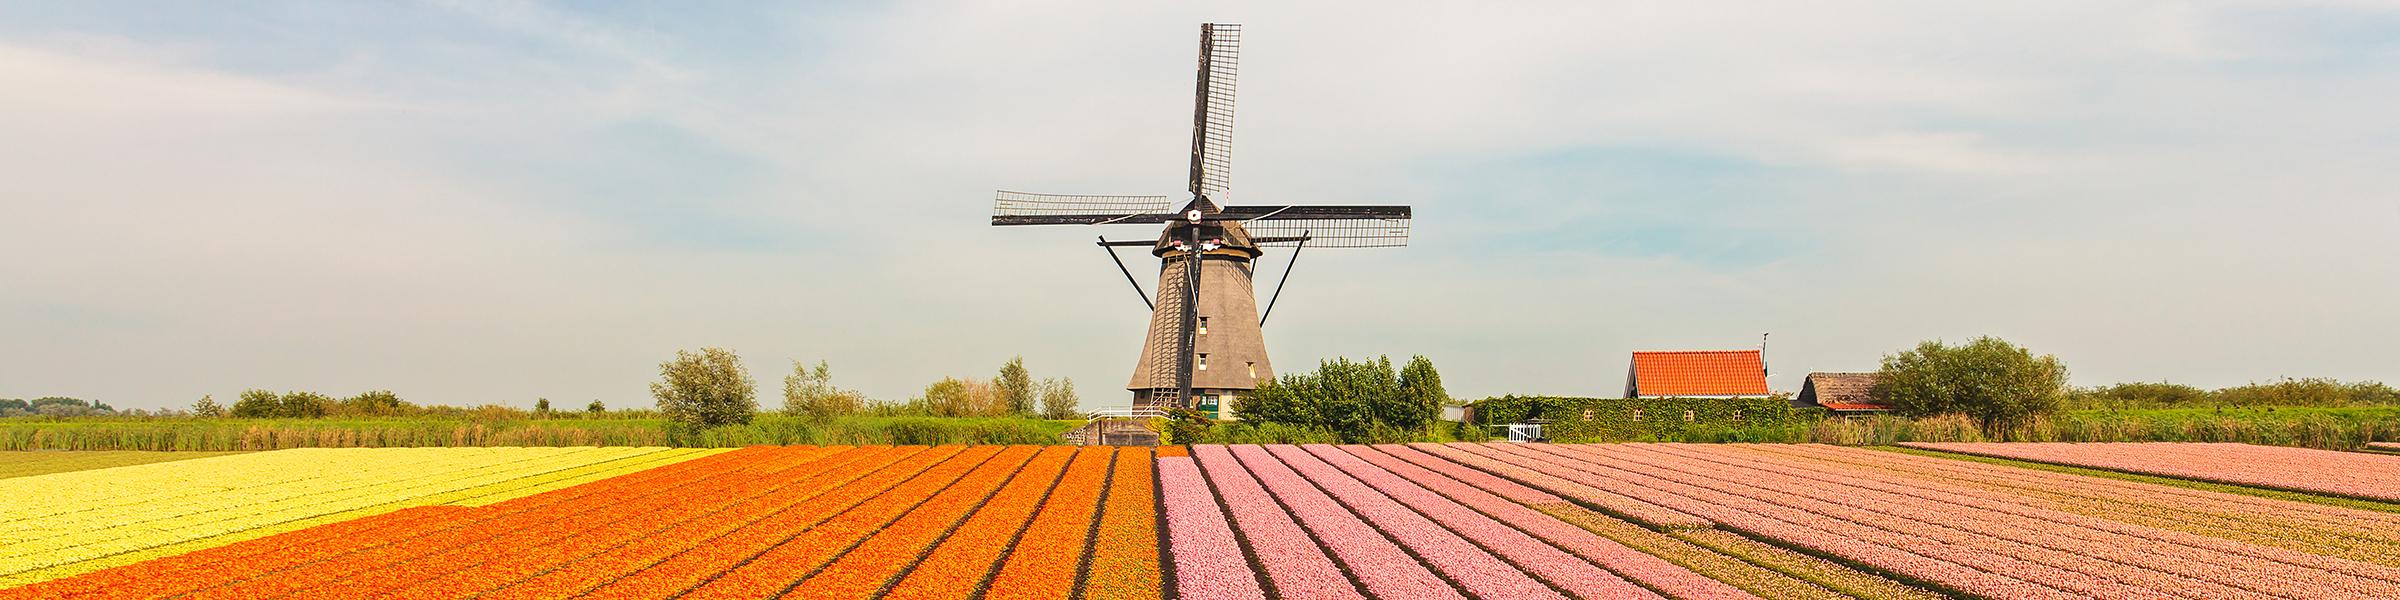 Netherlands Tulip Fileld